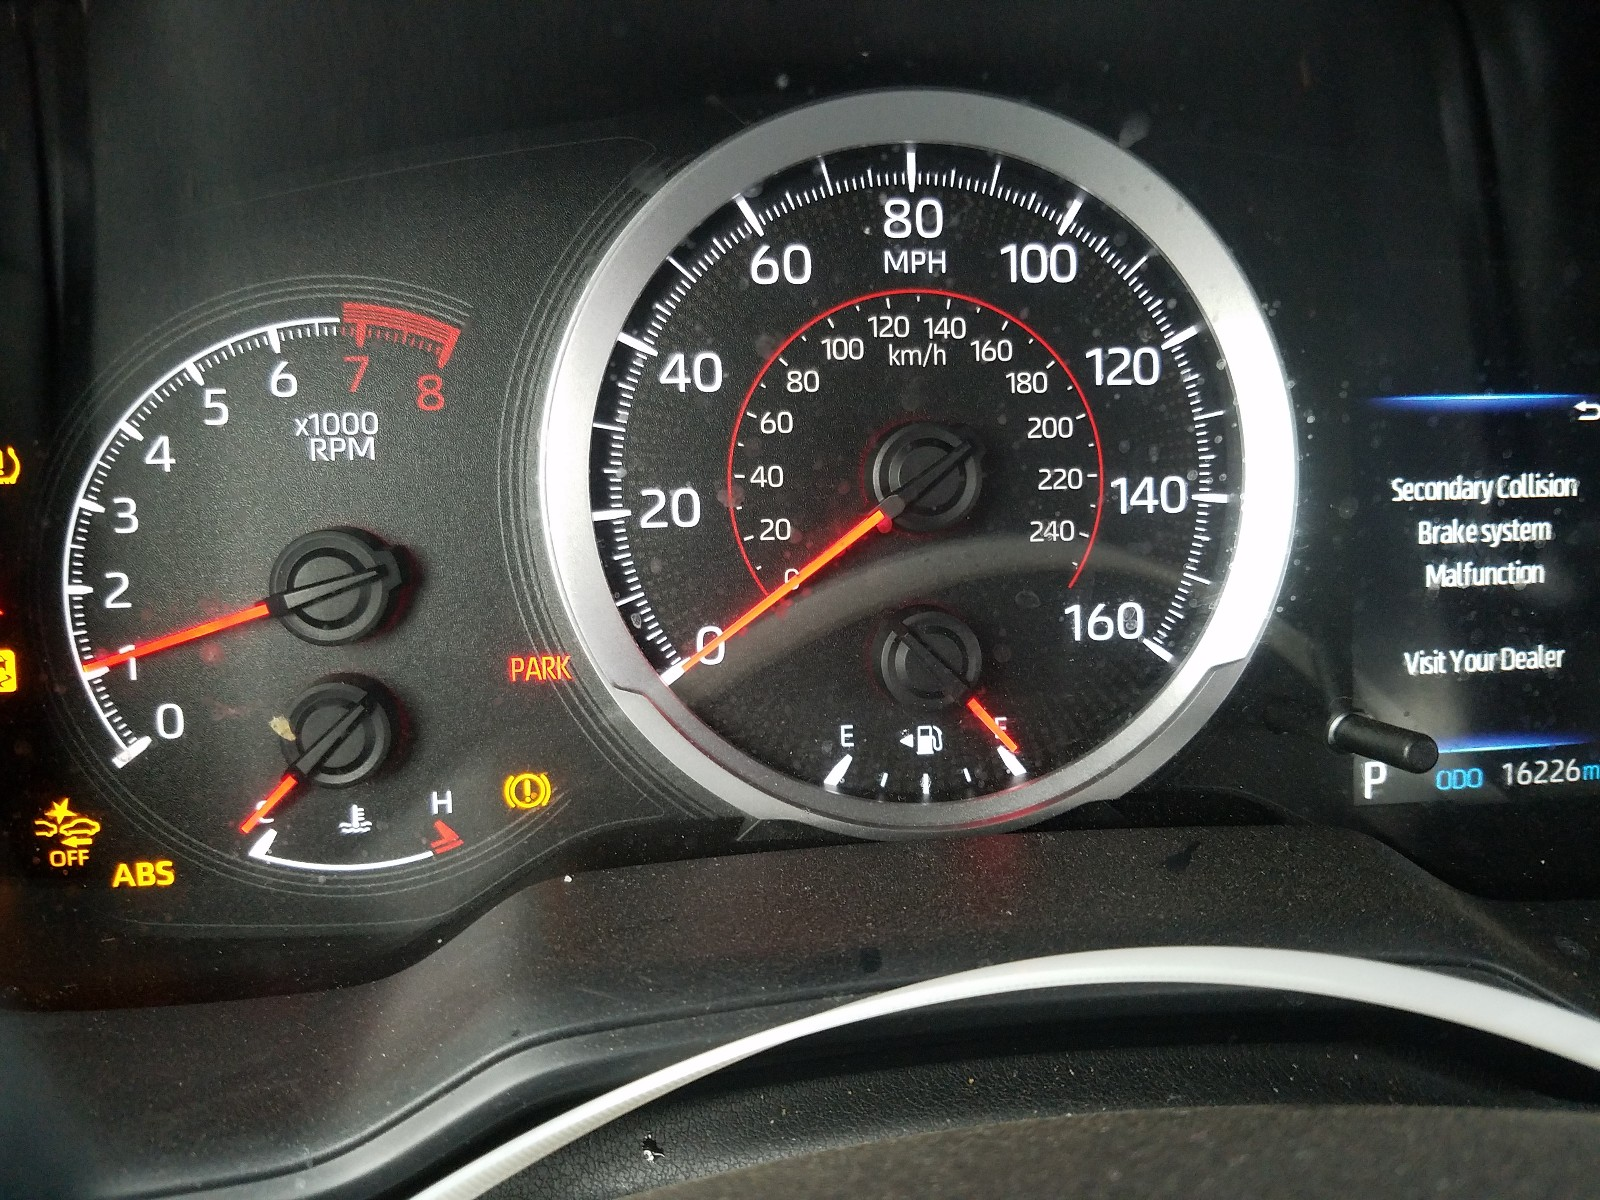 JTDS4RCE3LJ035185 - 2020 Toyota Corolla Se 2.0L front view